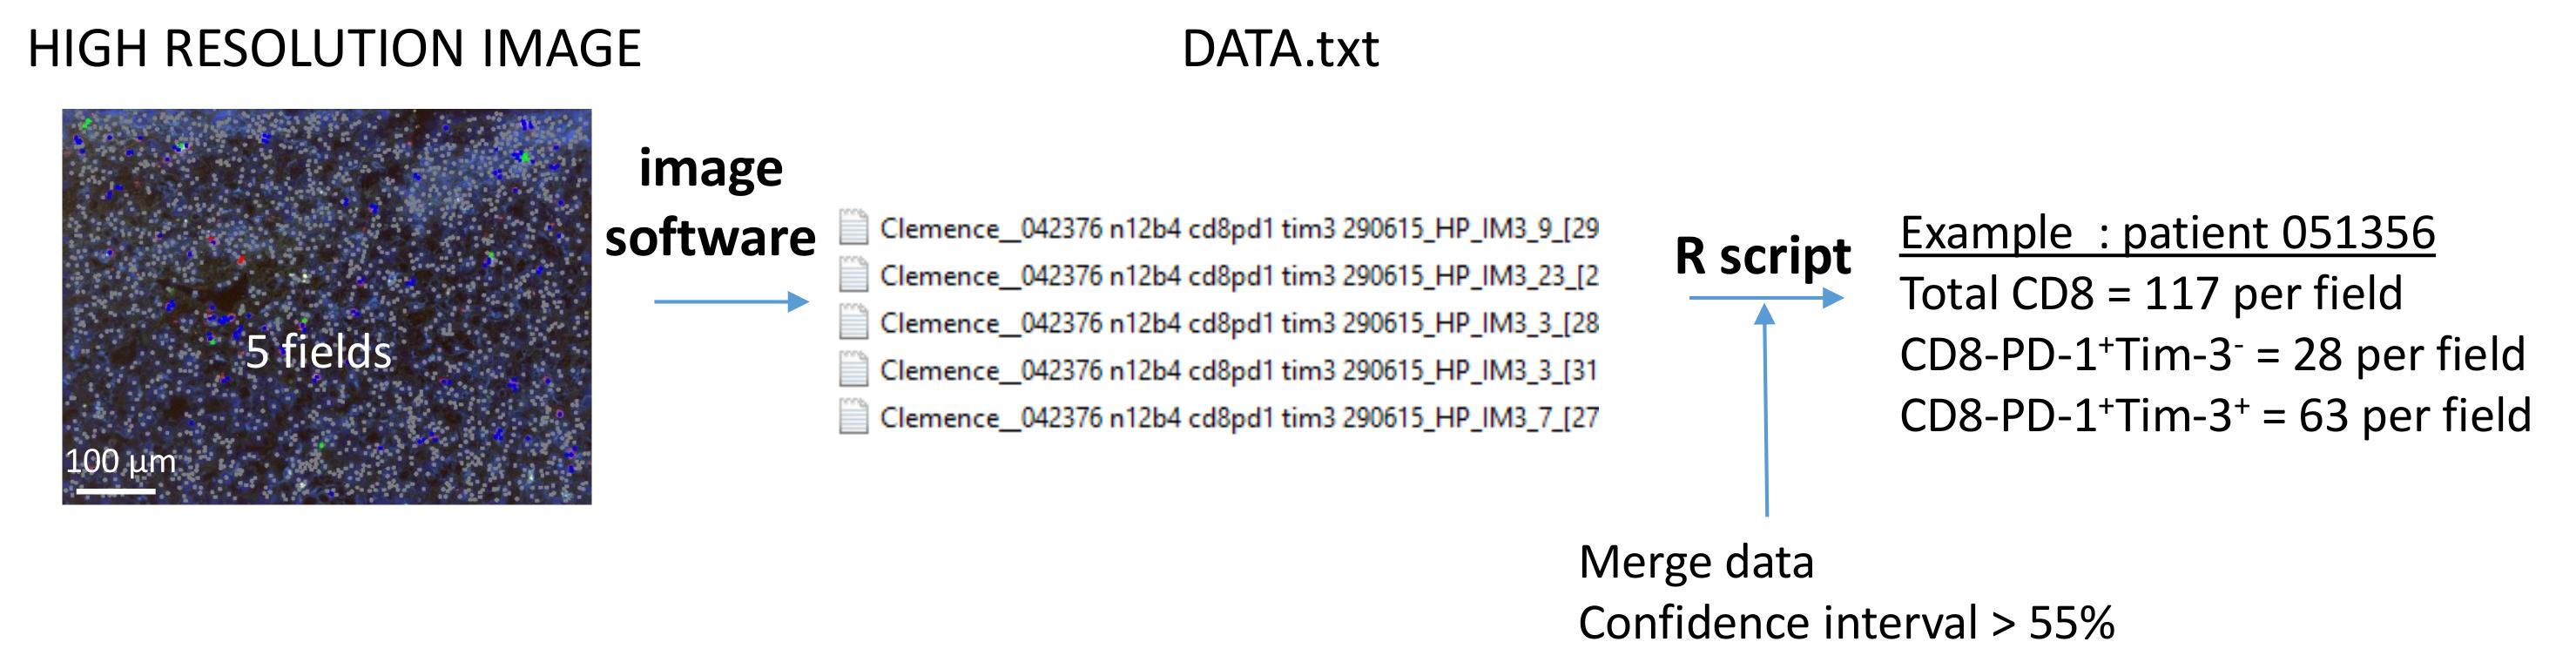 Multiplexed Immunofluorescence Analysis and Quantification